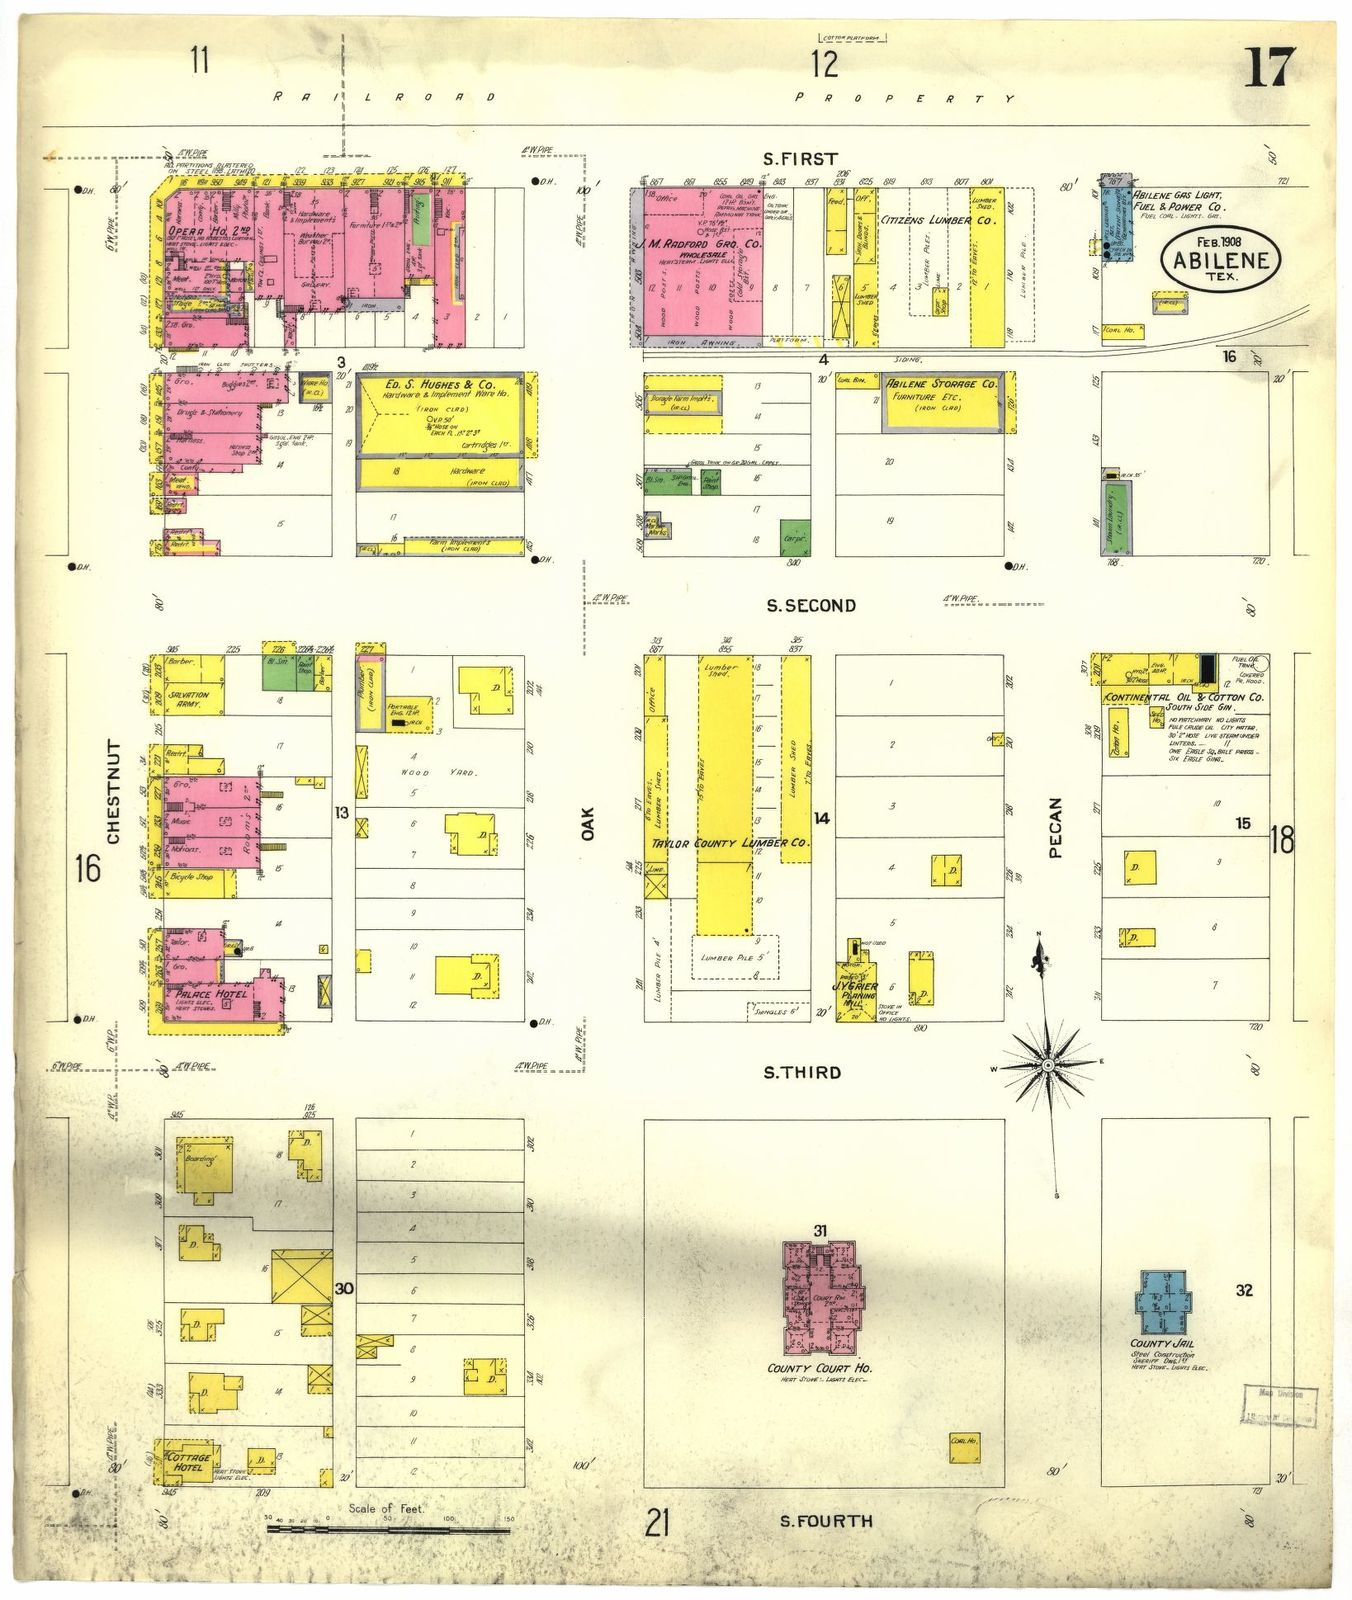 Sanborn Fire Insurance Map from Abilene, Taylor County, Texas.